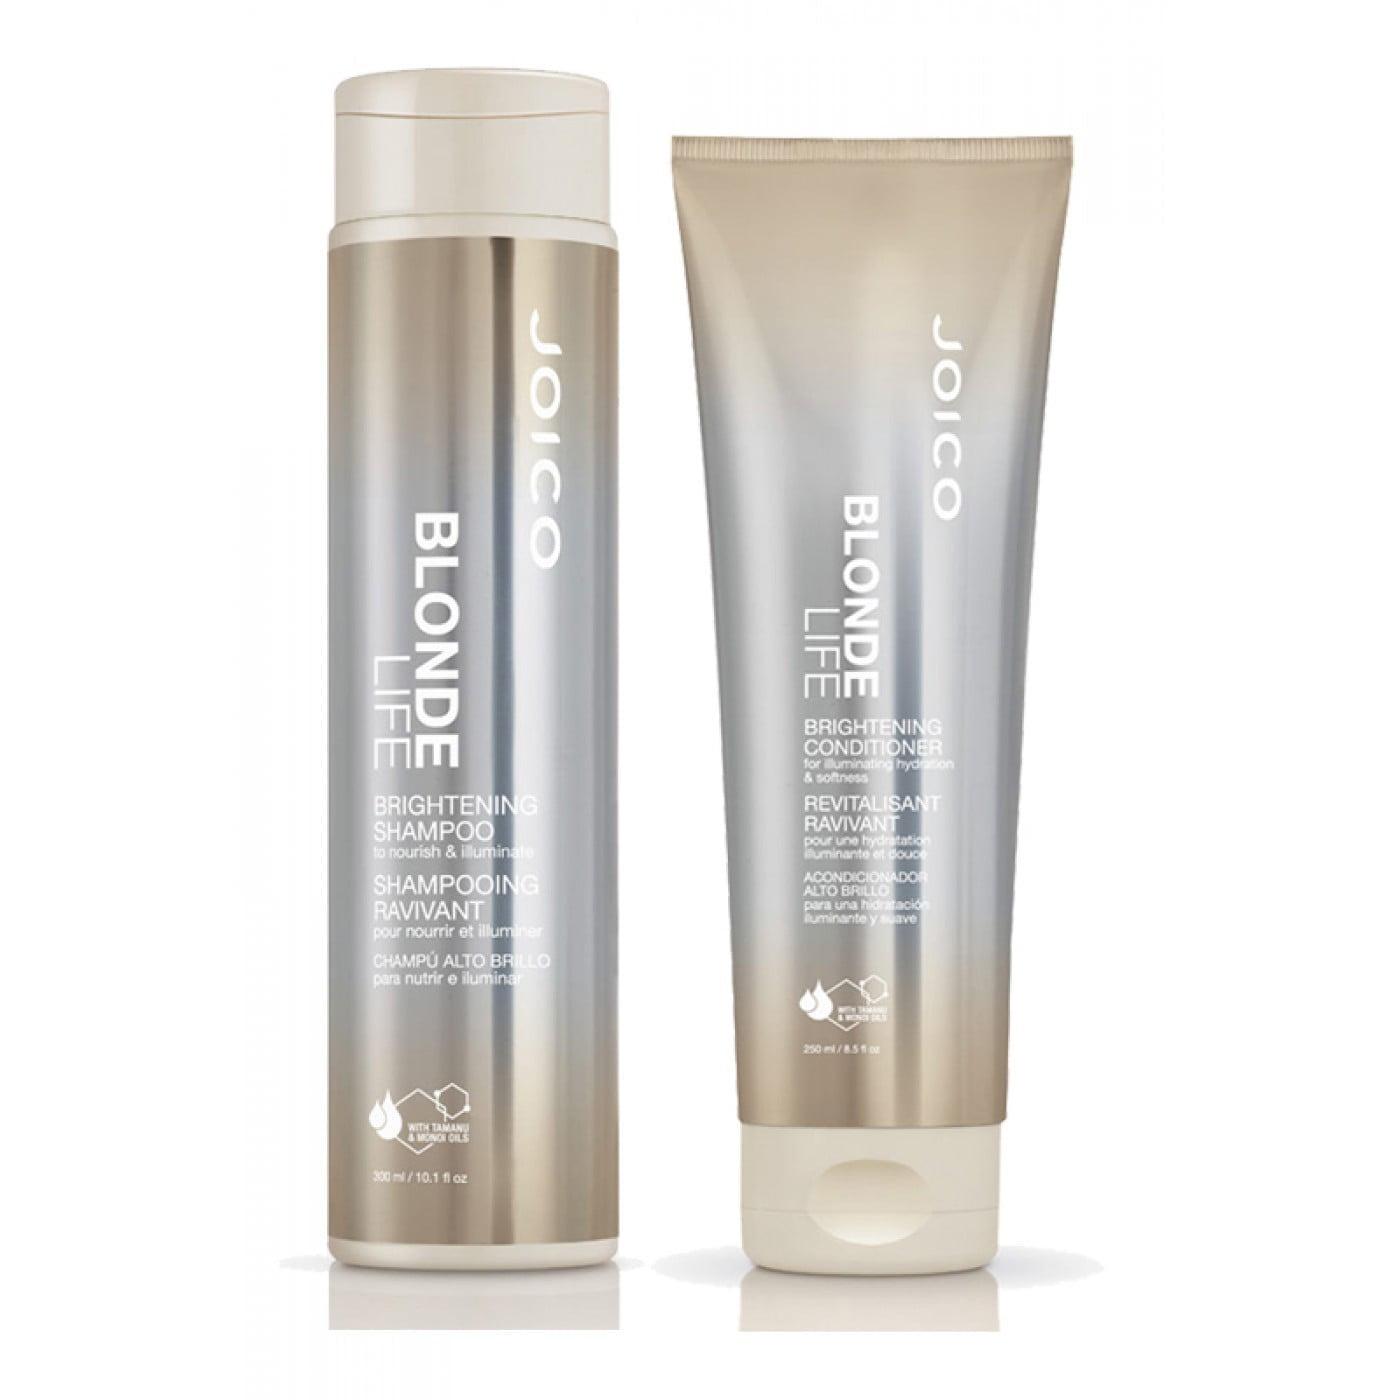 Shampoo e Condicionador Iluminador Joico Blonde Life para Cabelos Loiros - Joico